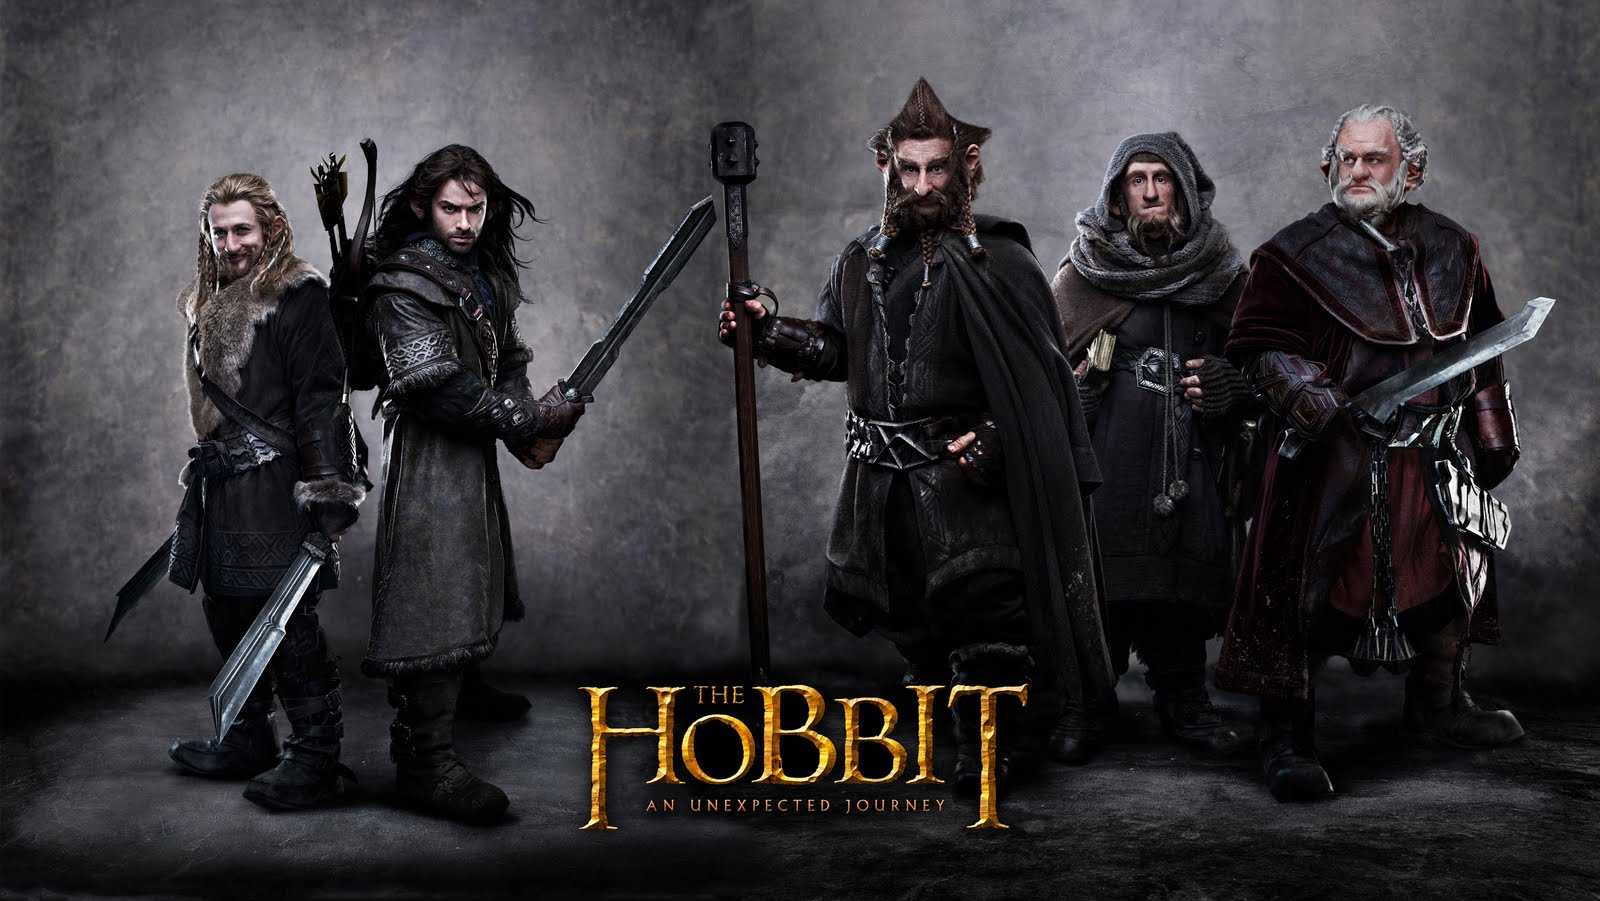 The Hobbit An Unexpected Journey 2012 HD Wallpapers Posters Desktop 1600x901